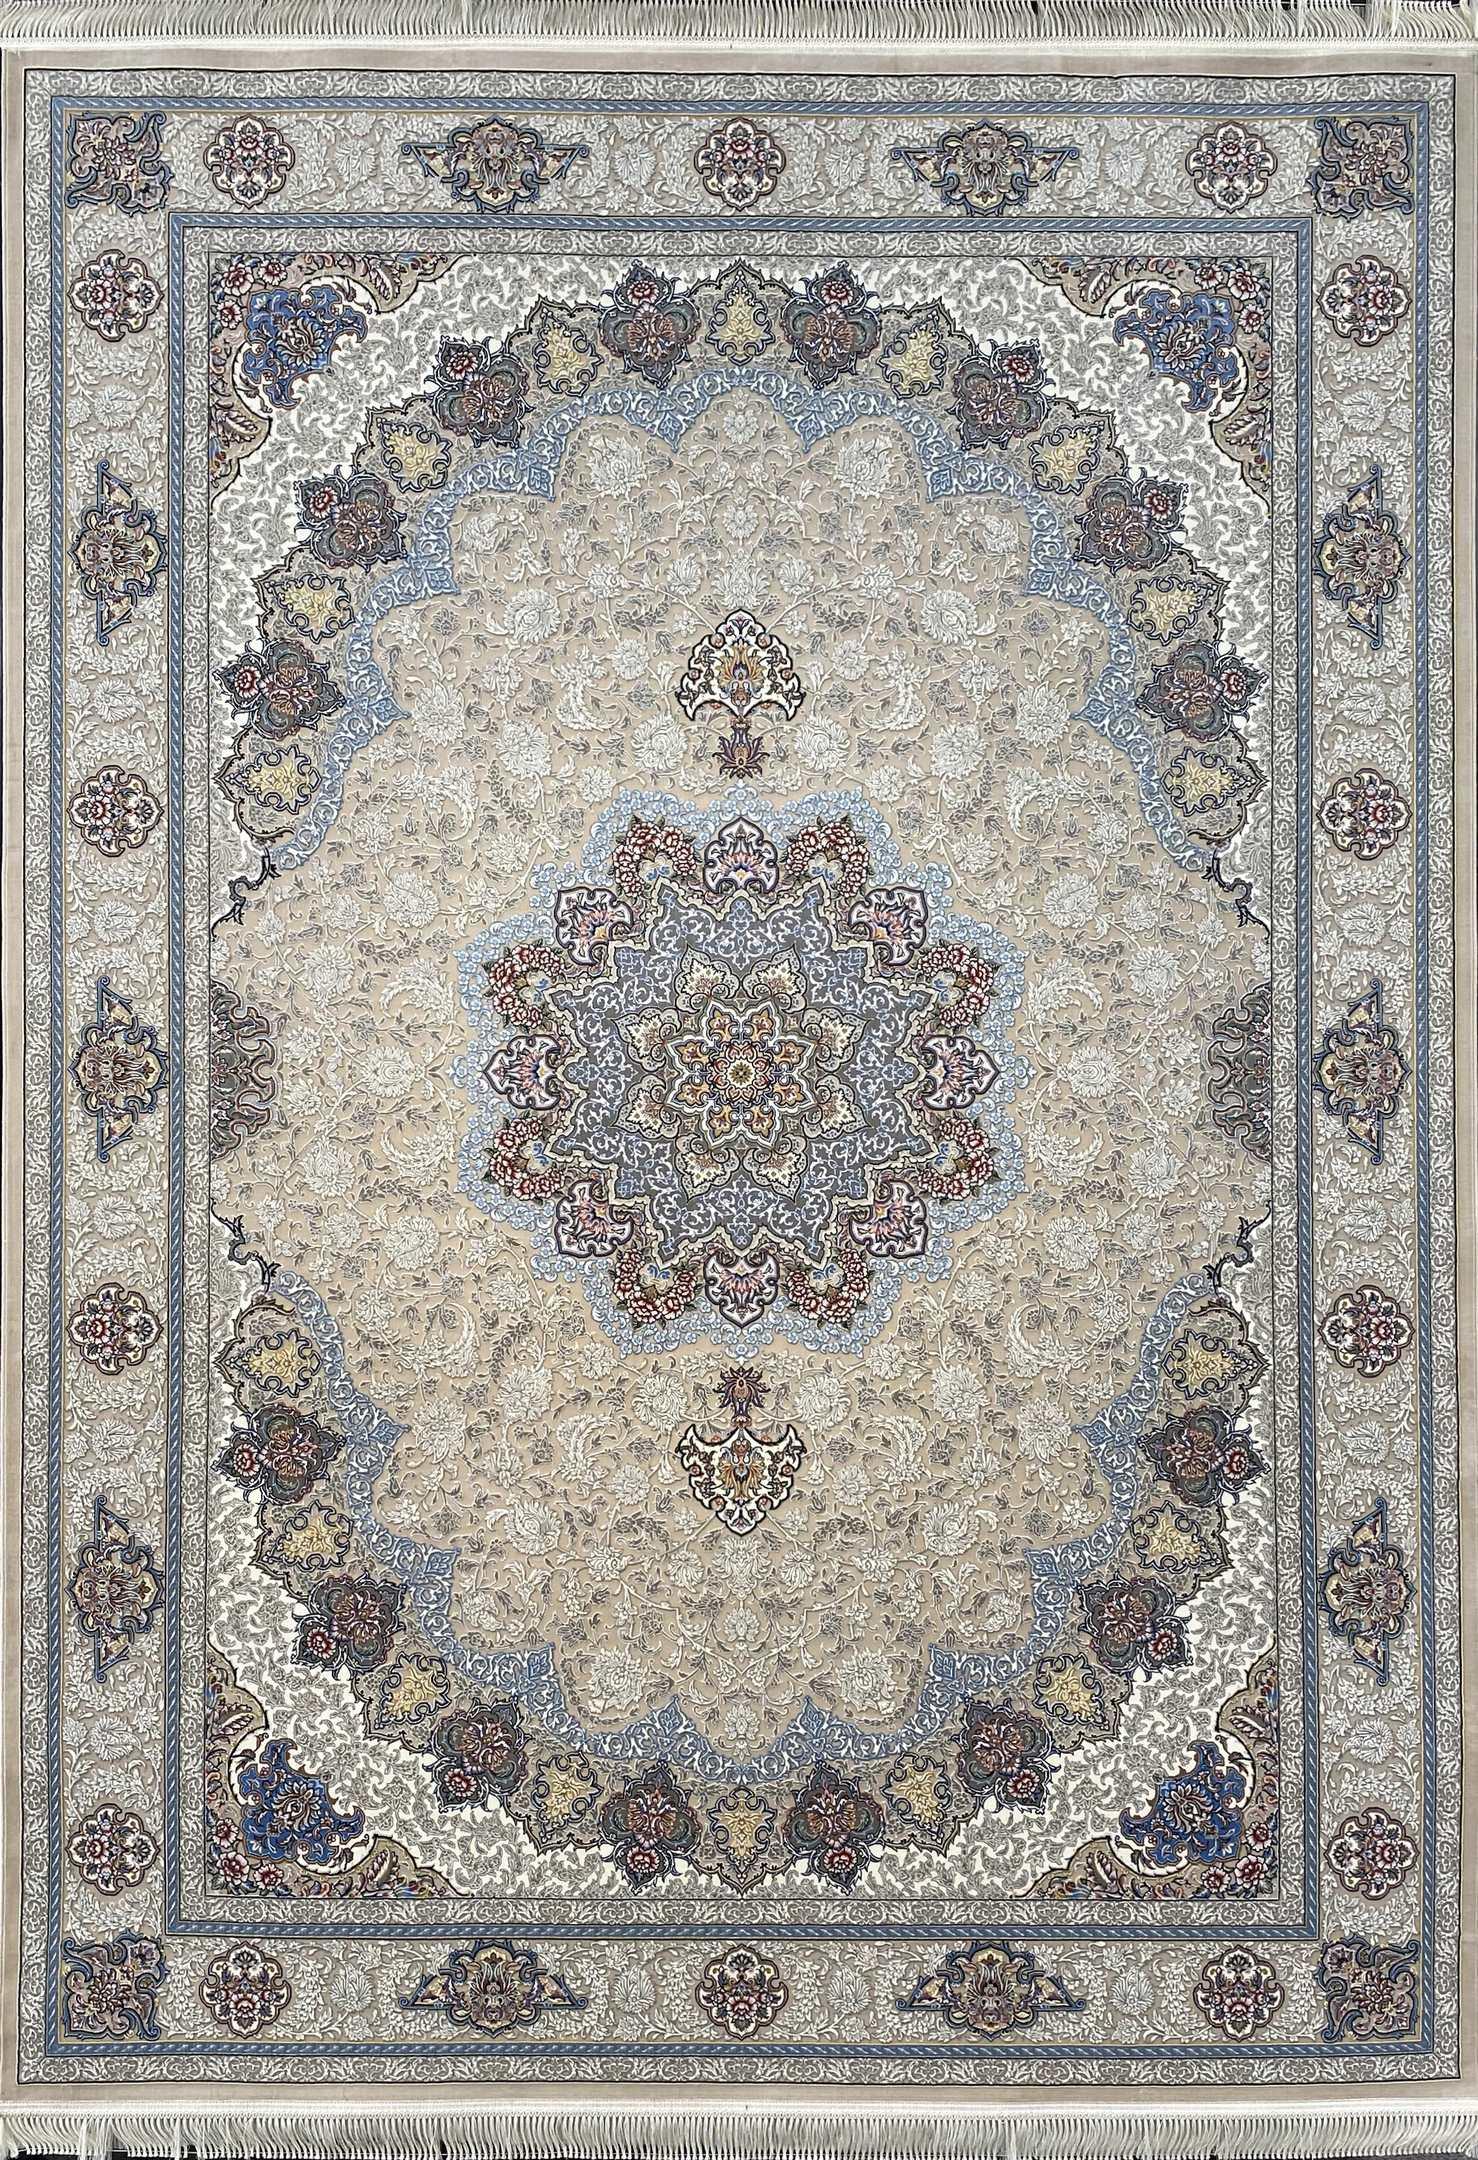 فرش کاشان -نقشه سروناز 1000 شانه کرم گلبرجسته